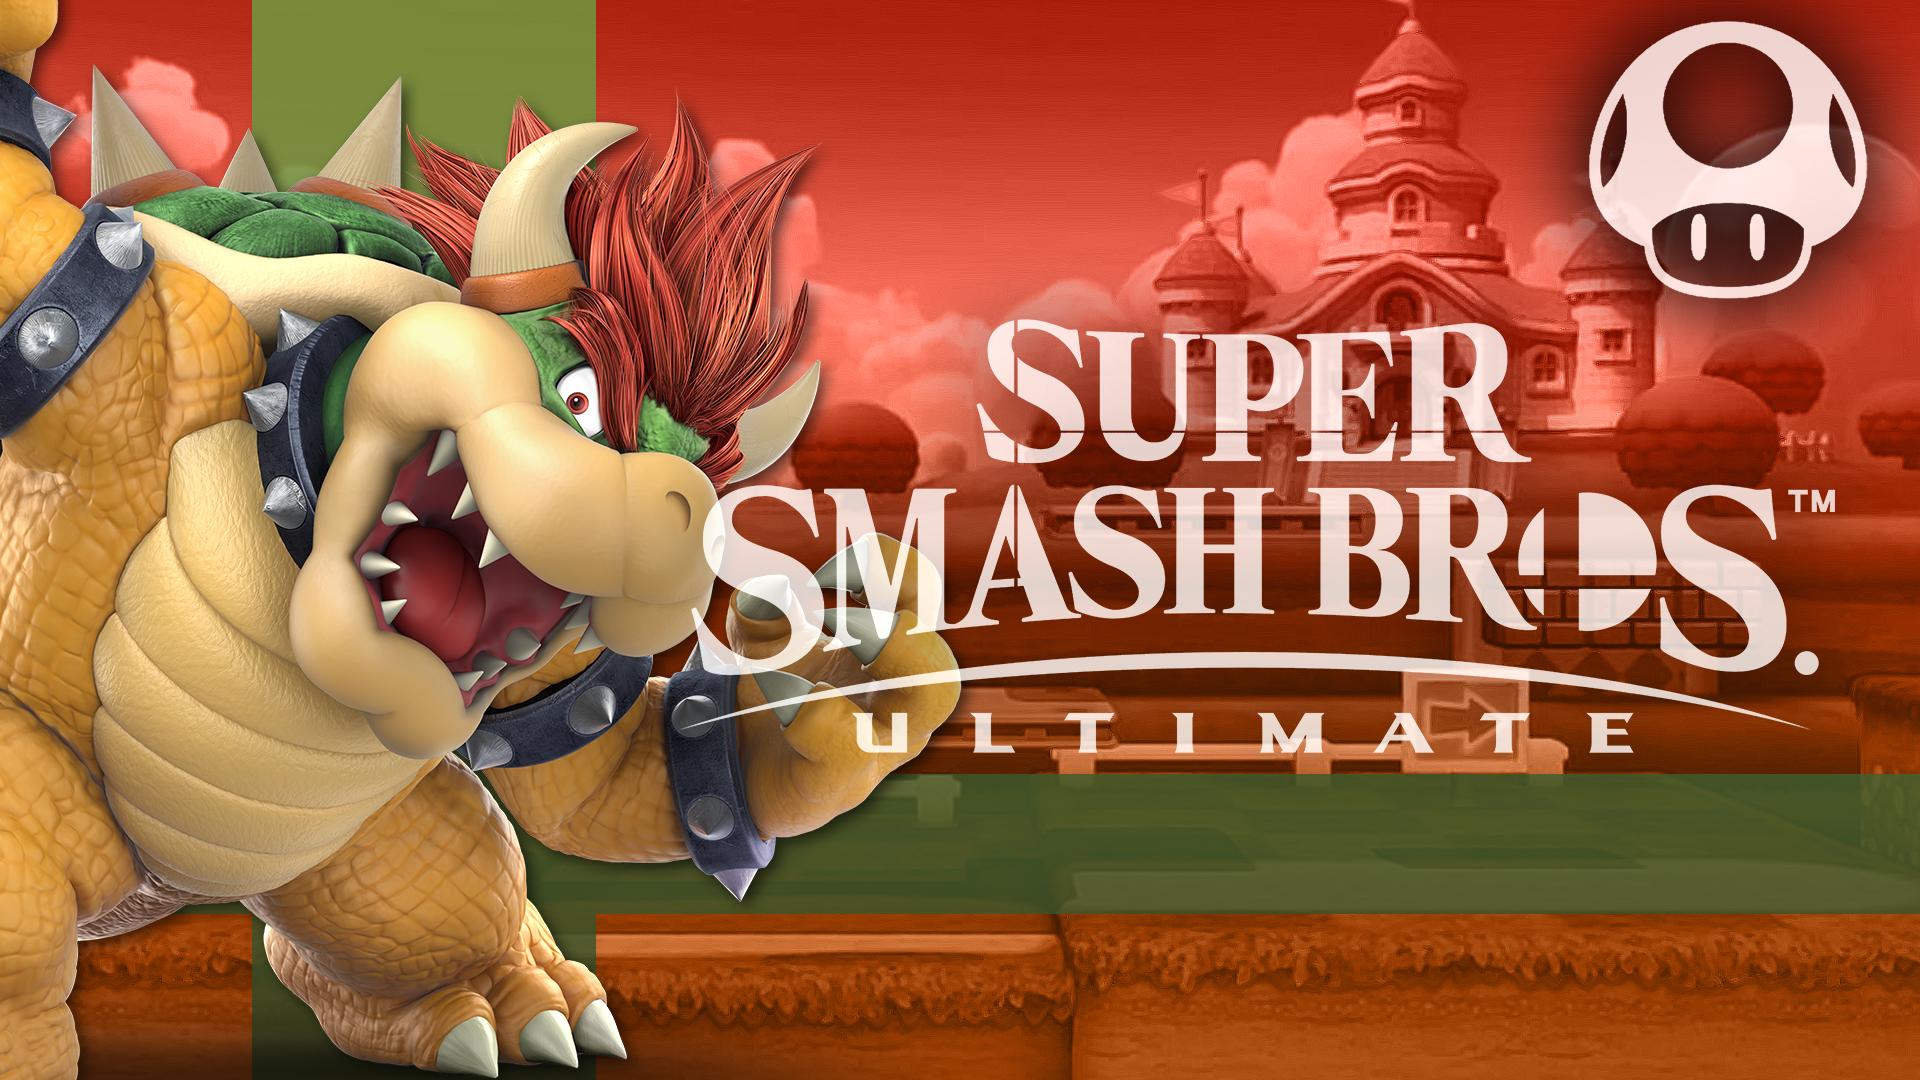 Bowser Super Mario Super Smash Bros Bowser Smash Ultimate